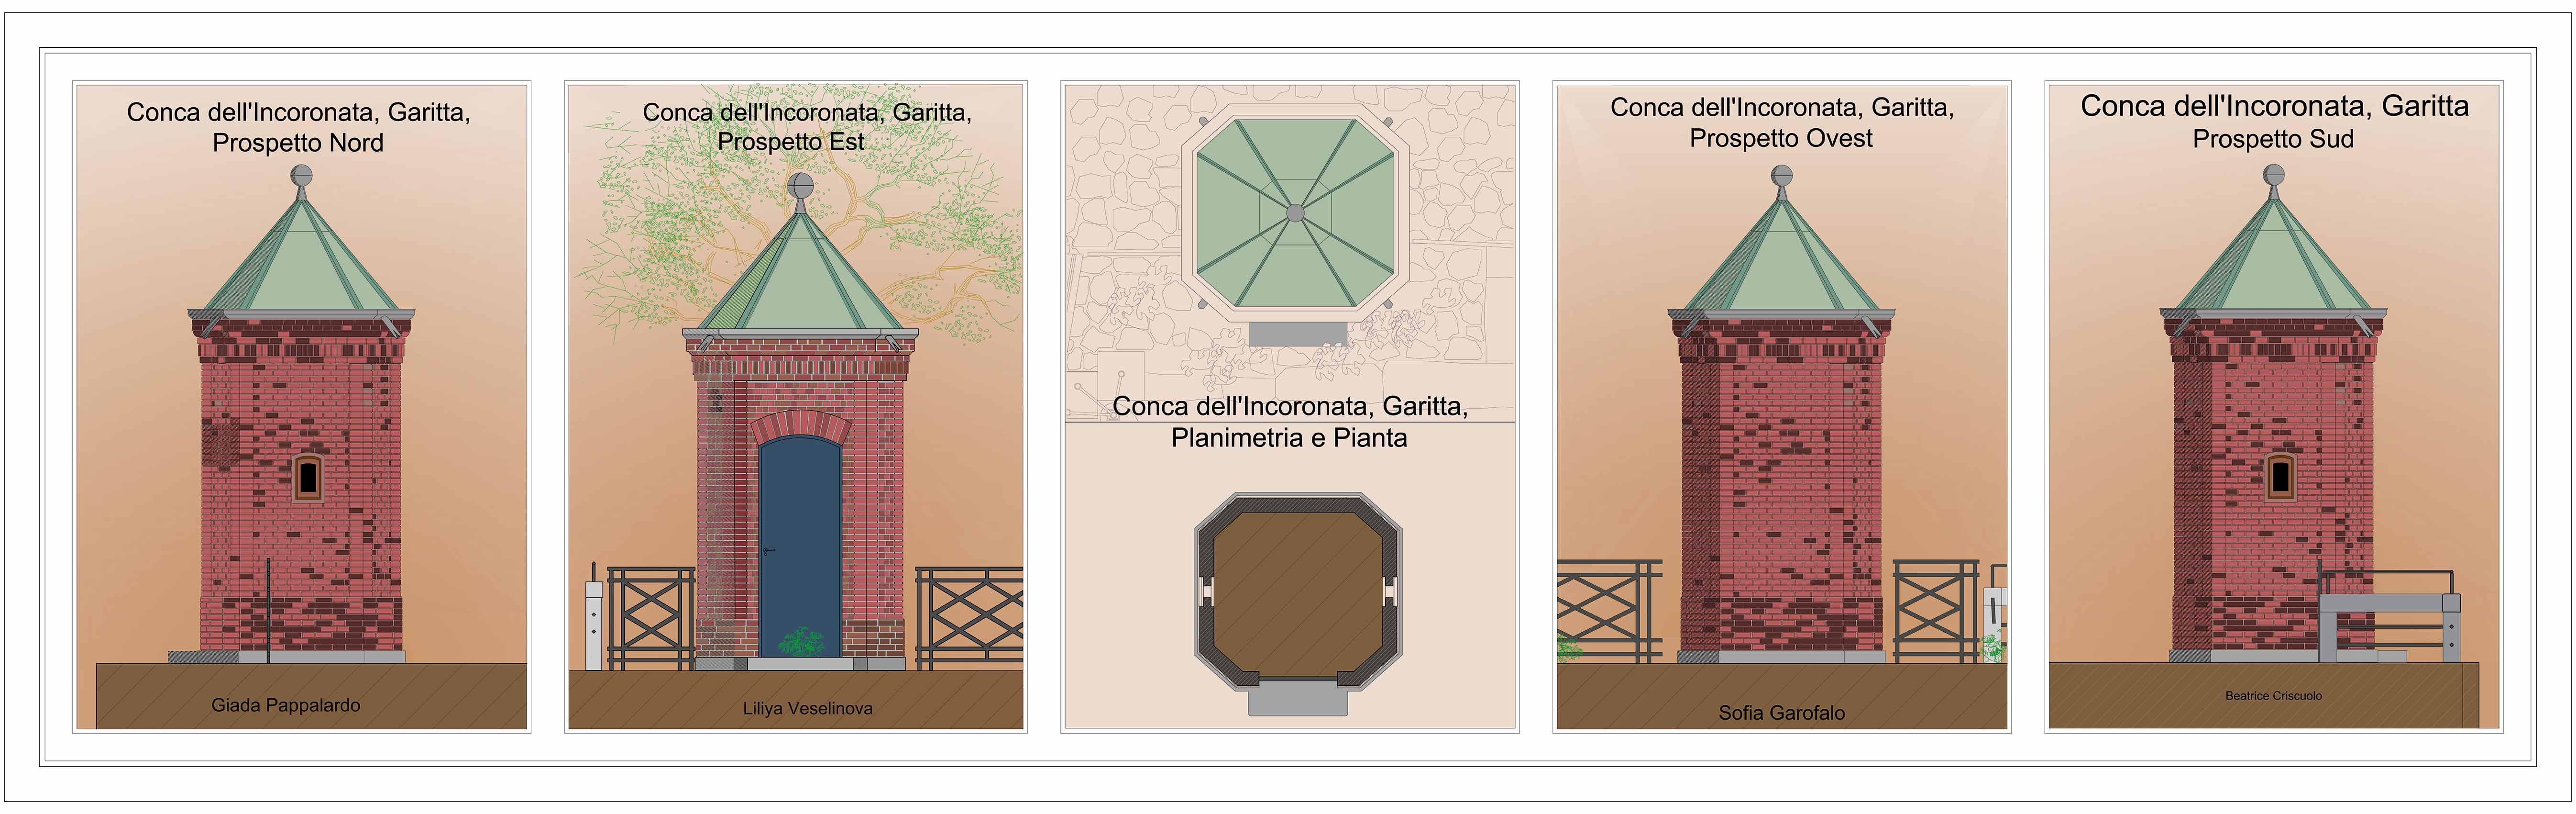 C:\001 Giuseppe\Lavori\LAS\AS16-17\5A\RilConca\Garitta Model (1)